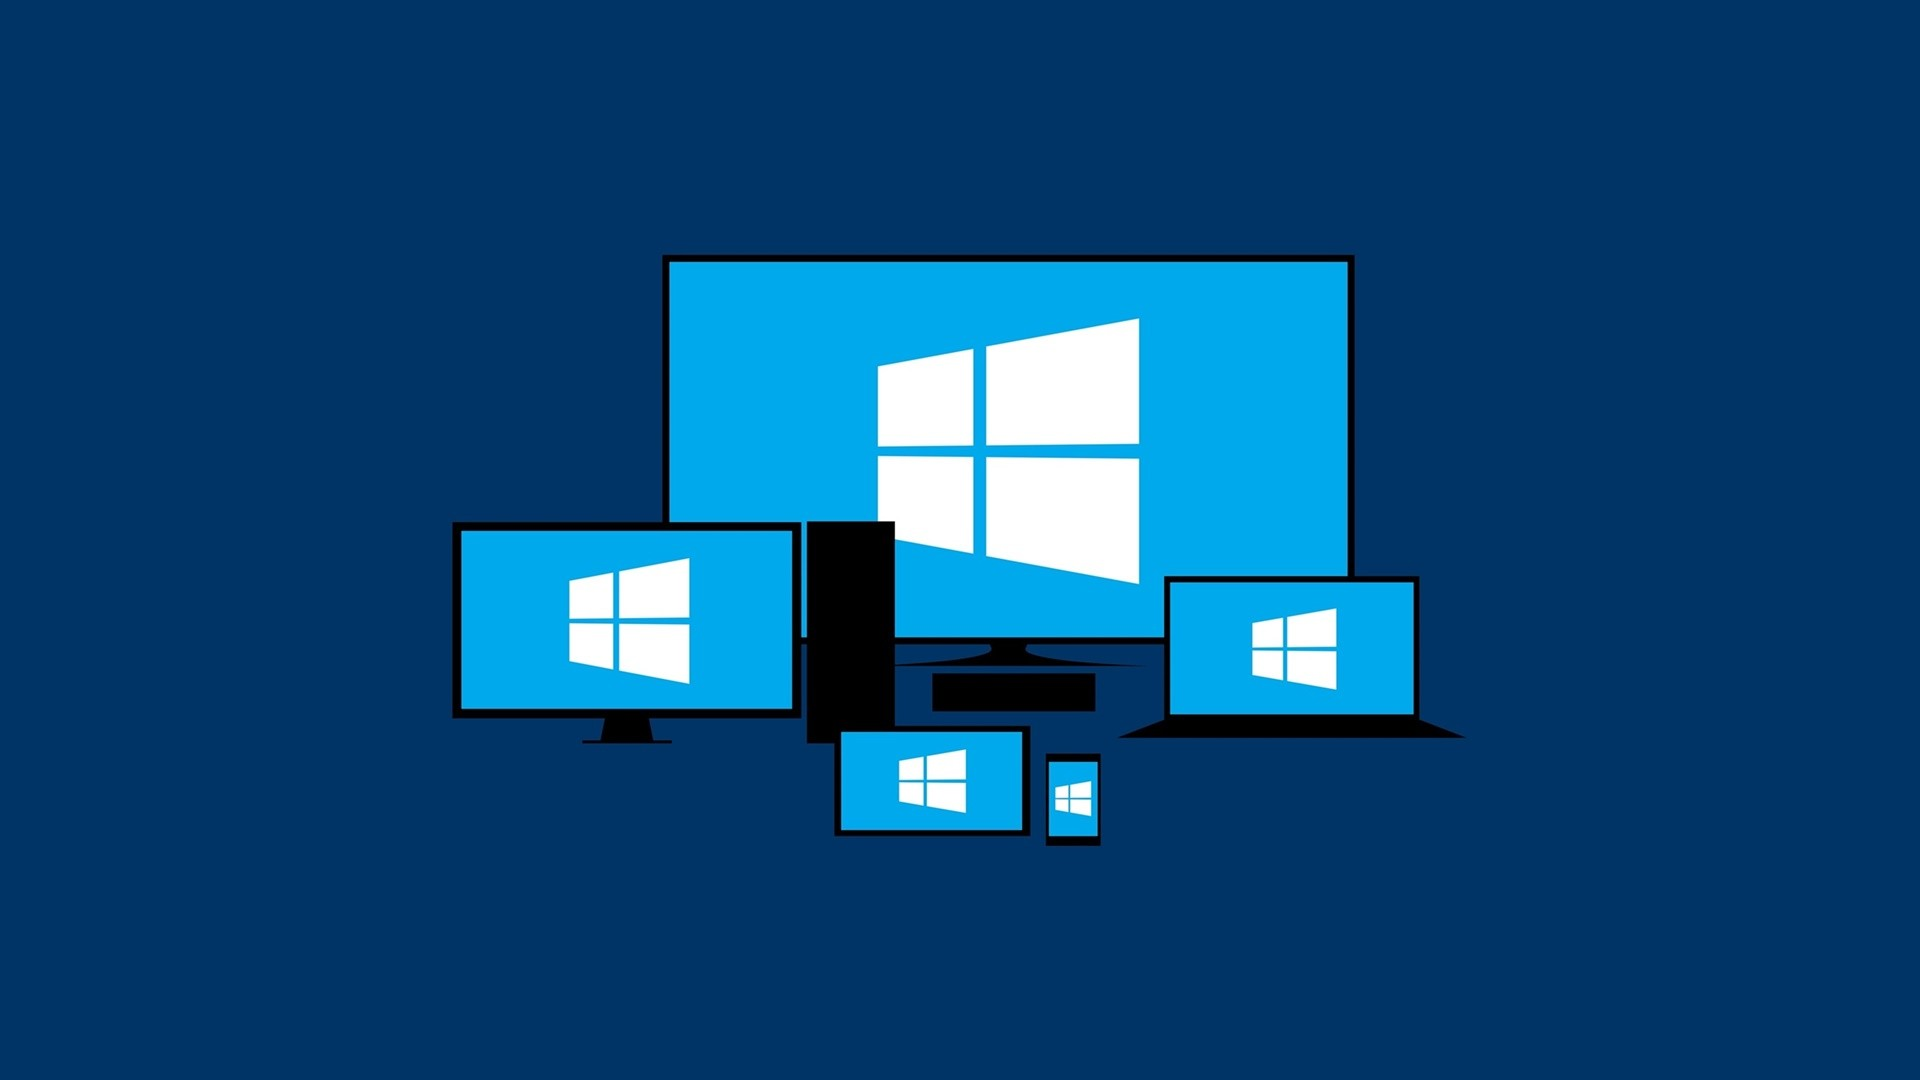 New Windows Logos Windows 10 Wallpapers